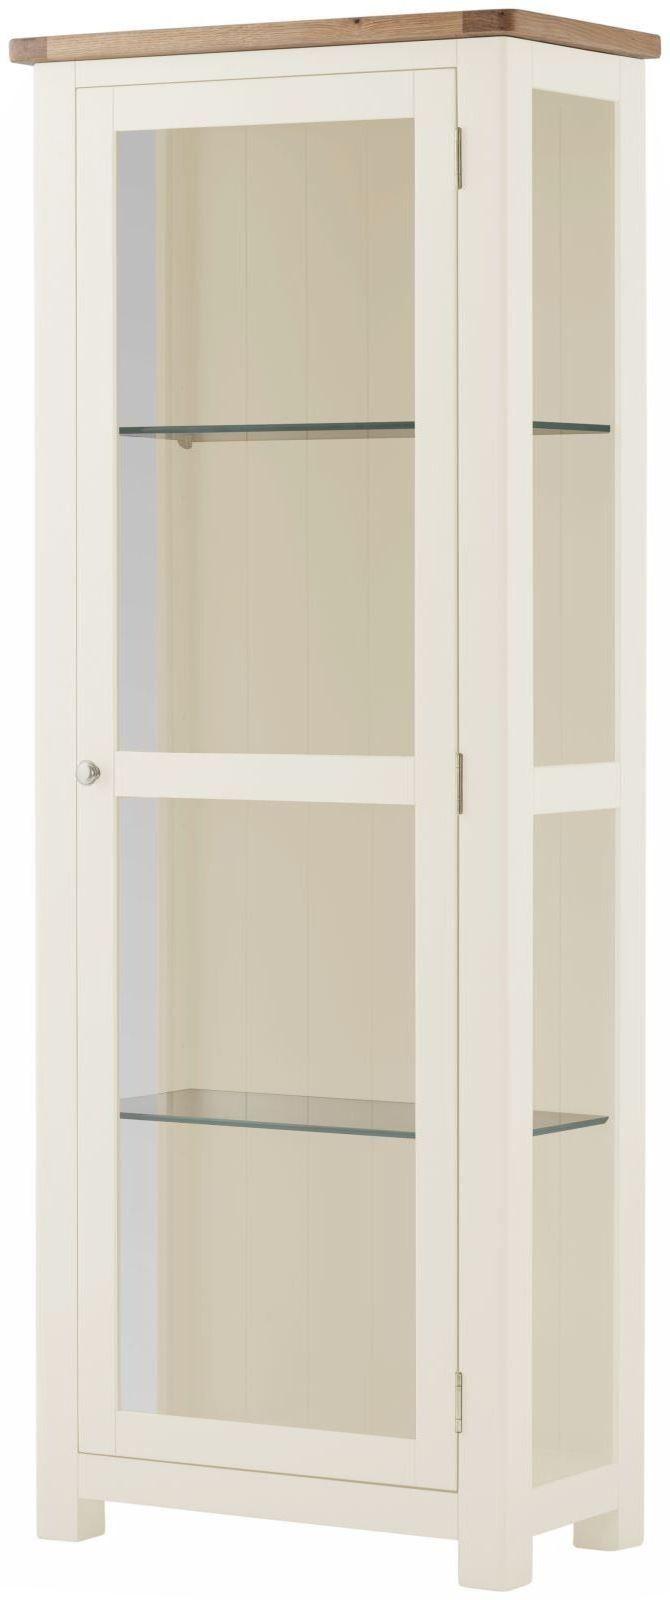 Stratton White Display Cabinet Height 1700 Width 650 Depth 350